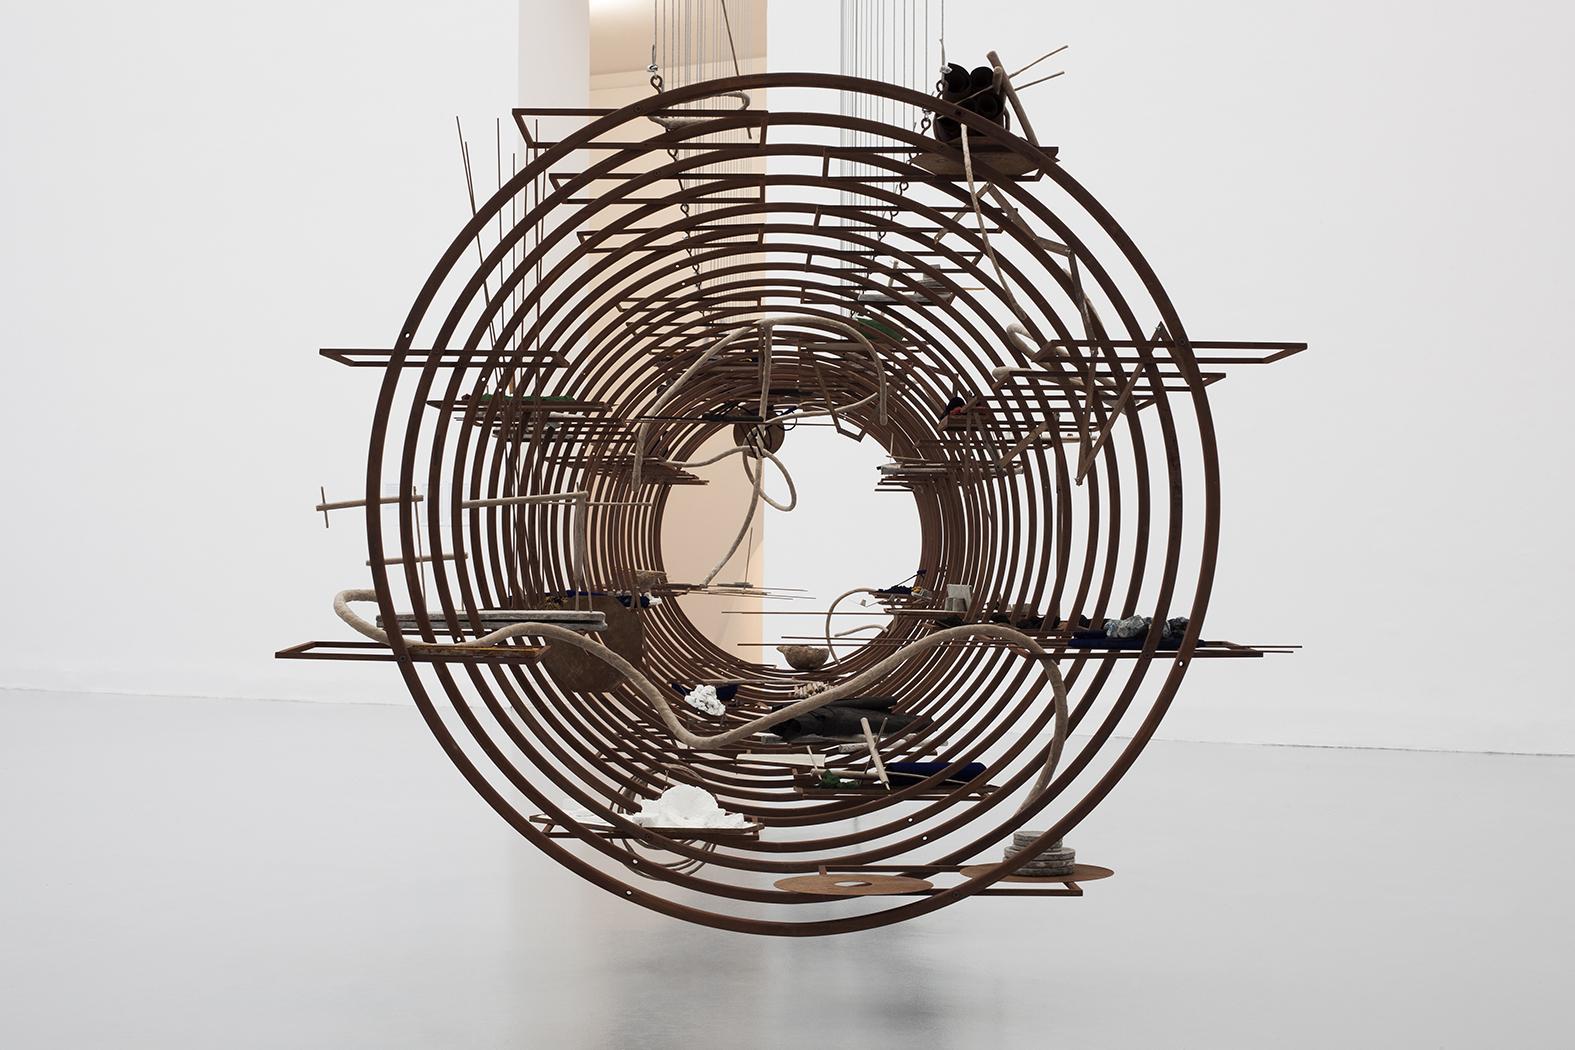 """Turba Turbo"", La Biennale di Venezia (źródło: materiały prasowe organizatora)"